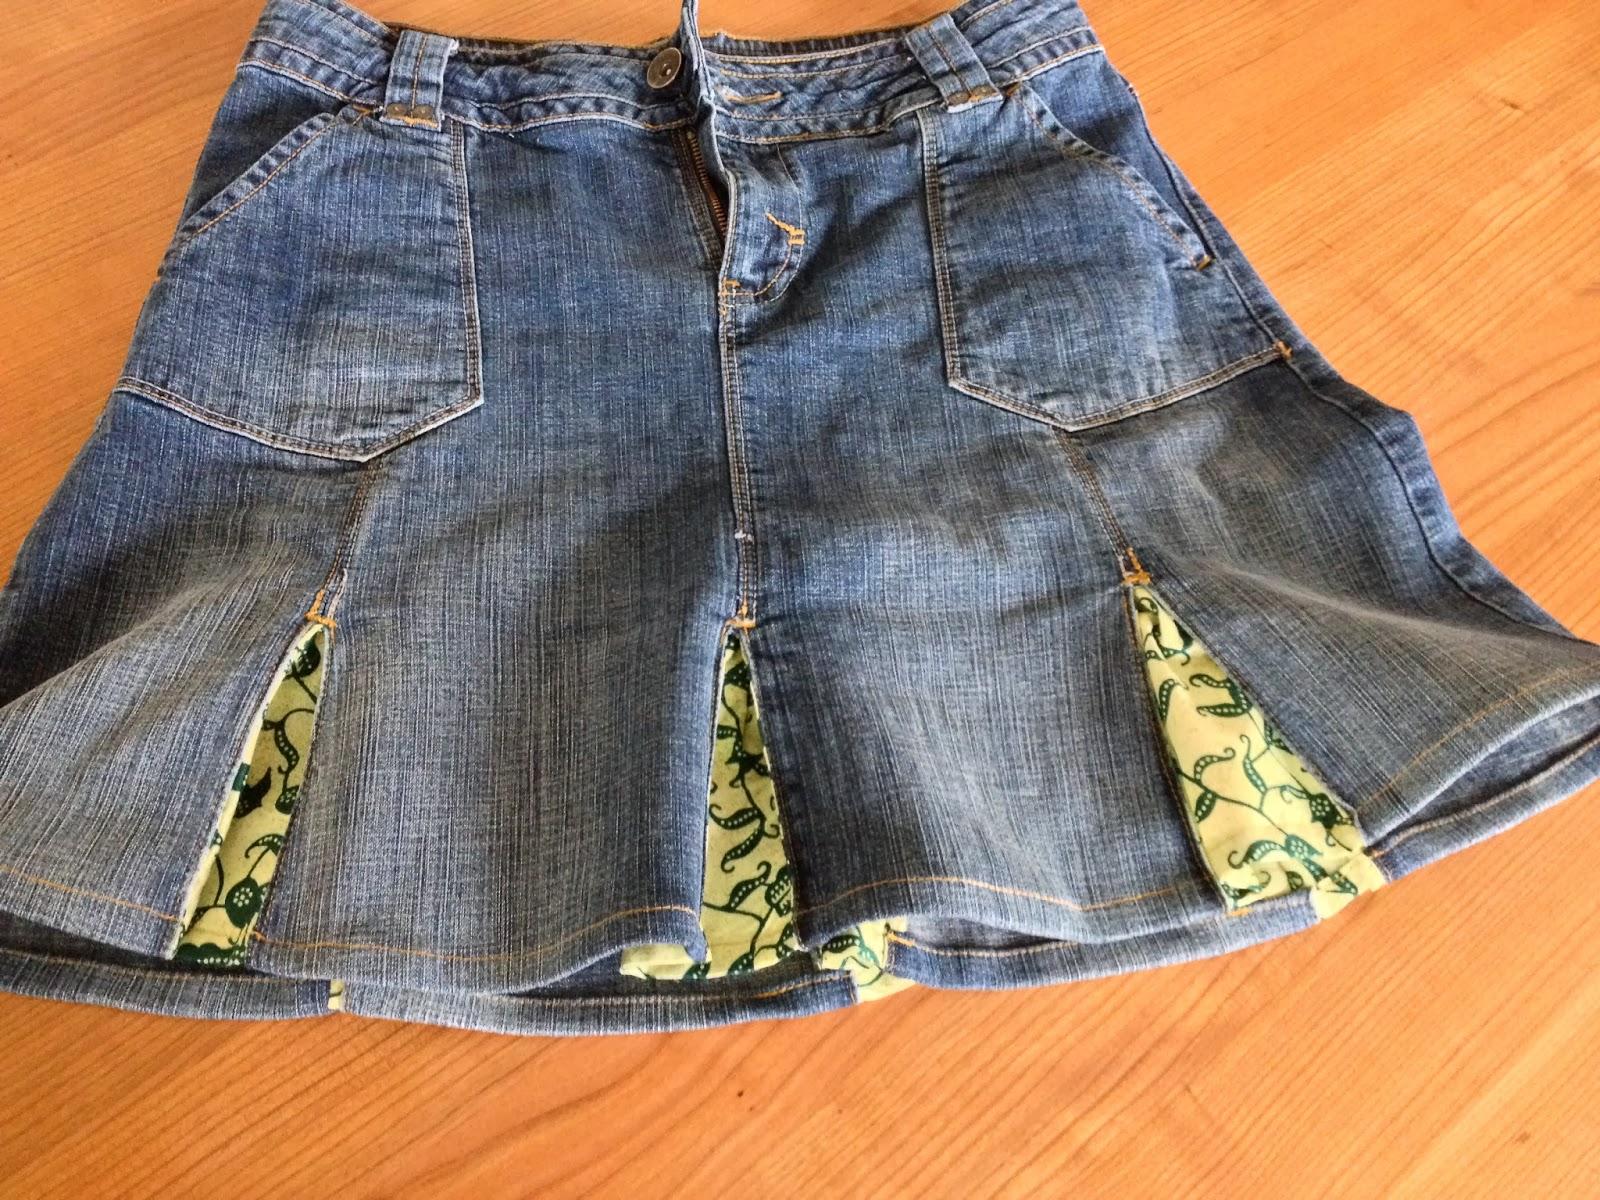 comment customiser une jupe en jeans how to upcycle a plain jeans skirt. Black Bedroom Furniture Sets. Home Design Ideas